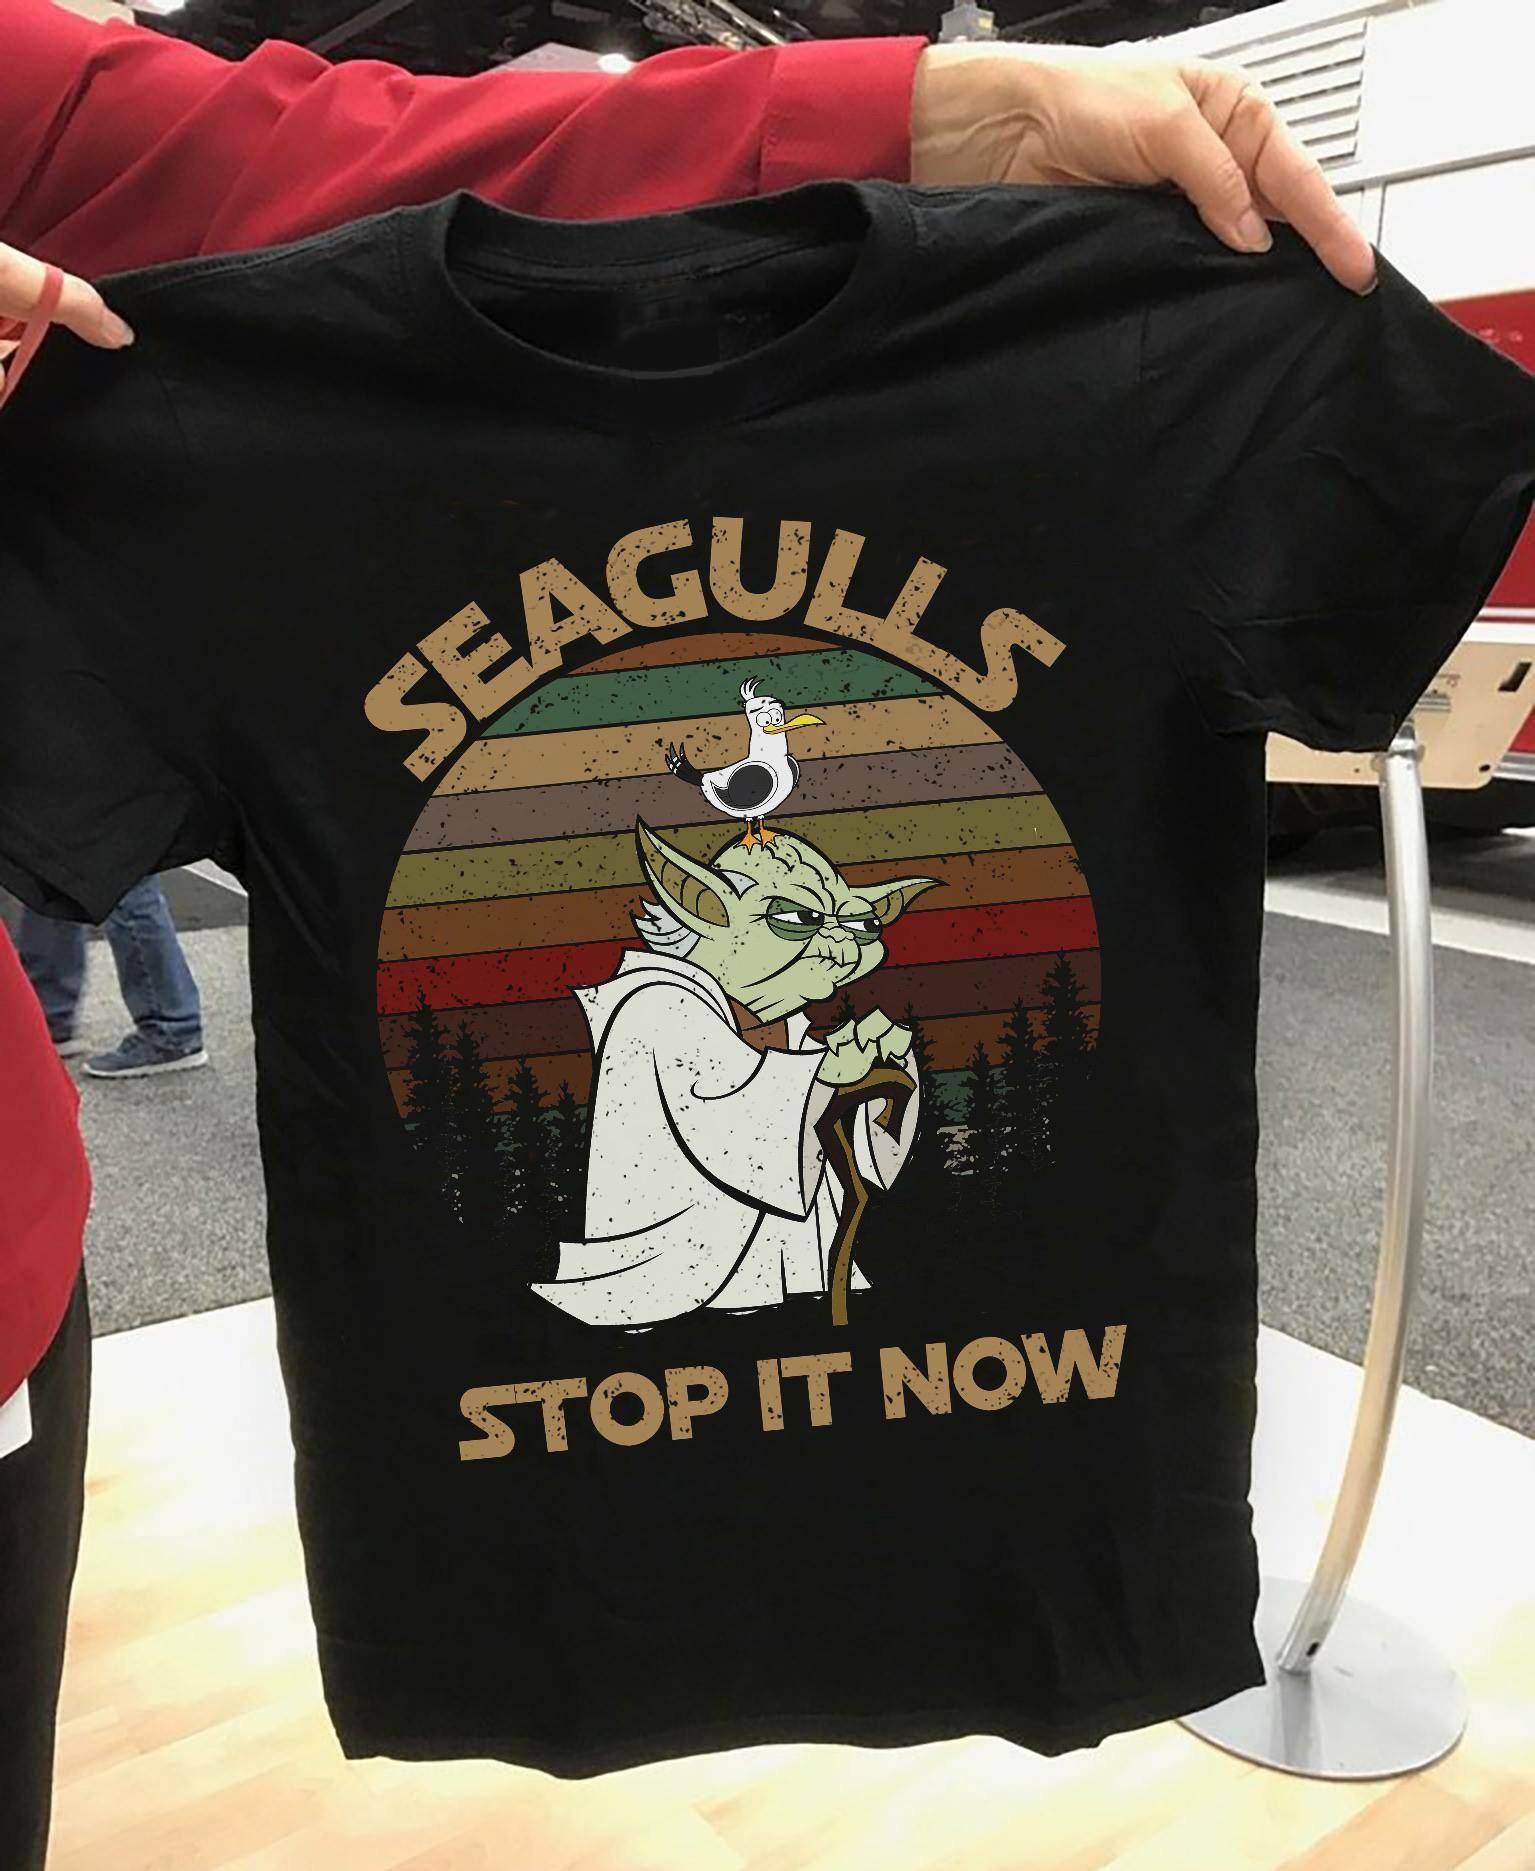 "I said, ""Seagulls, mmm! Stop it now!"""